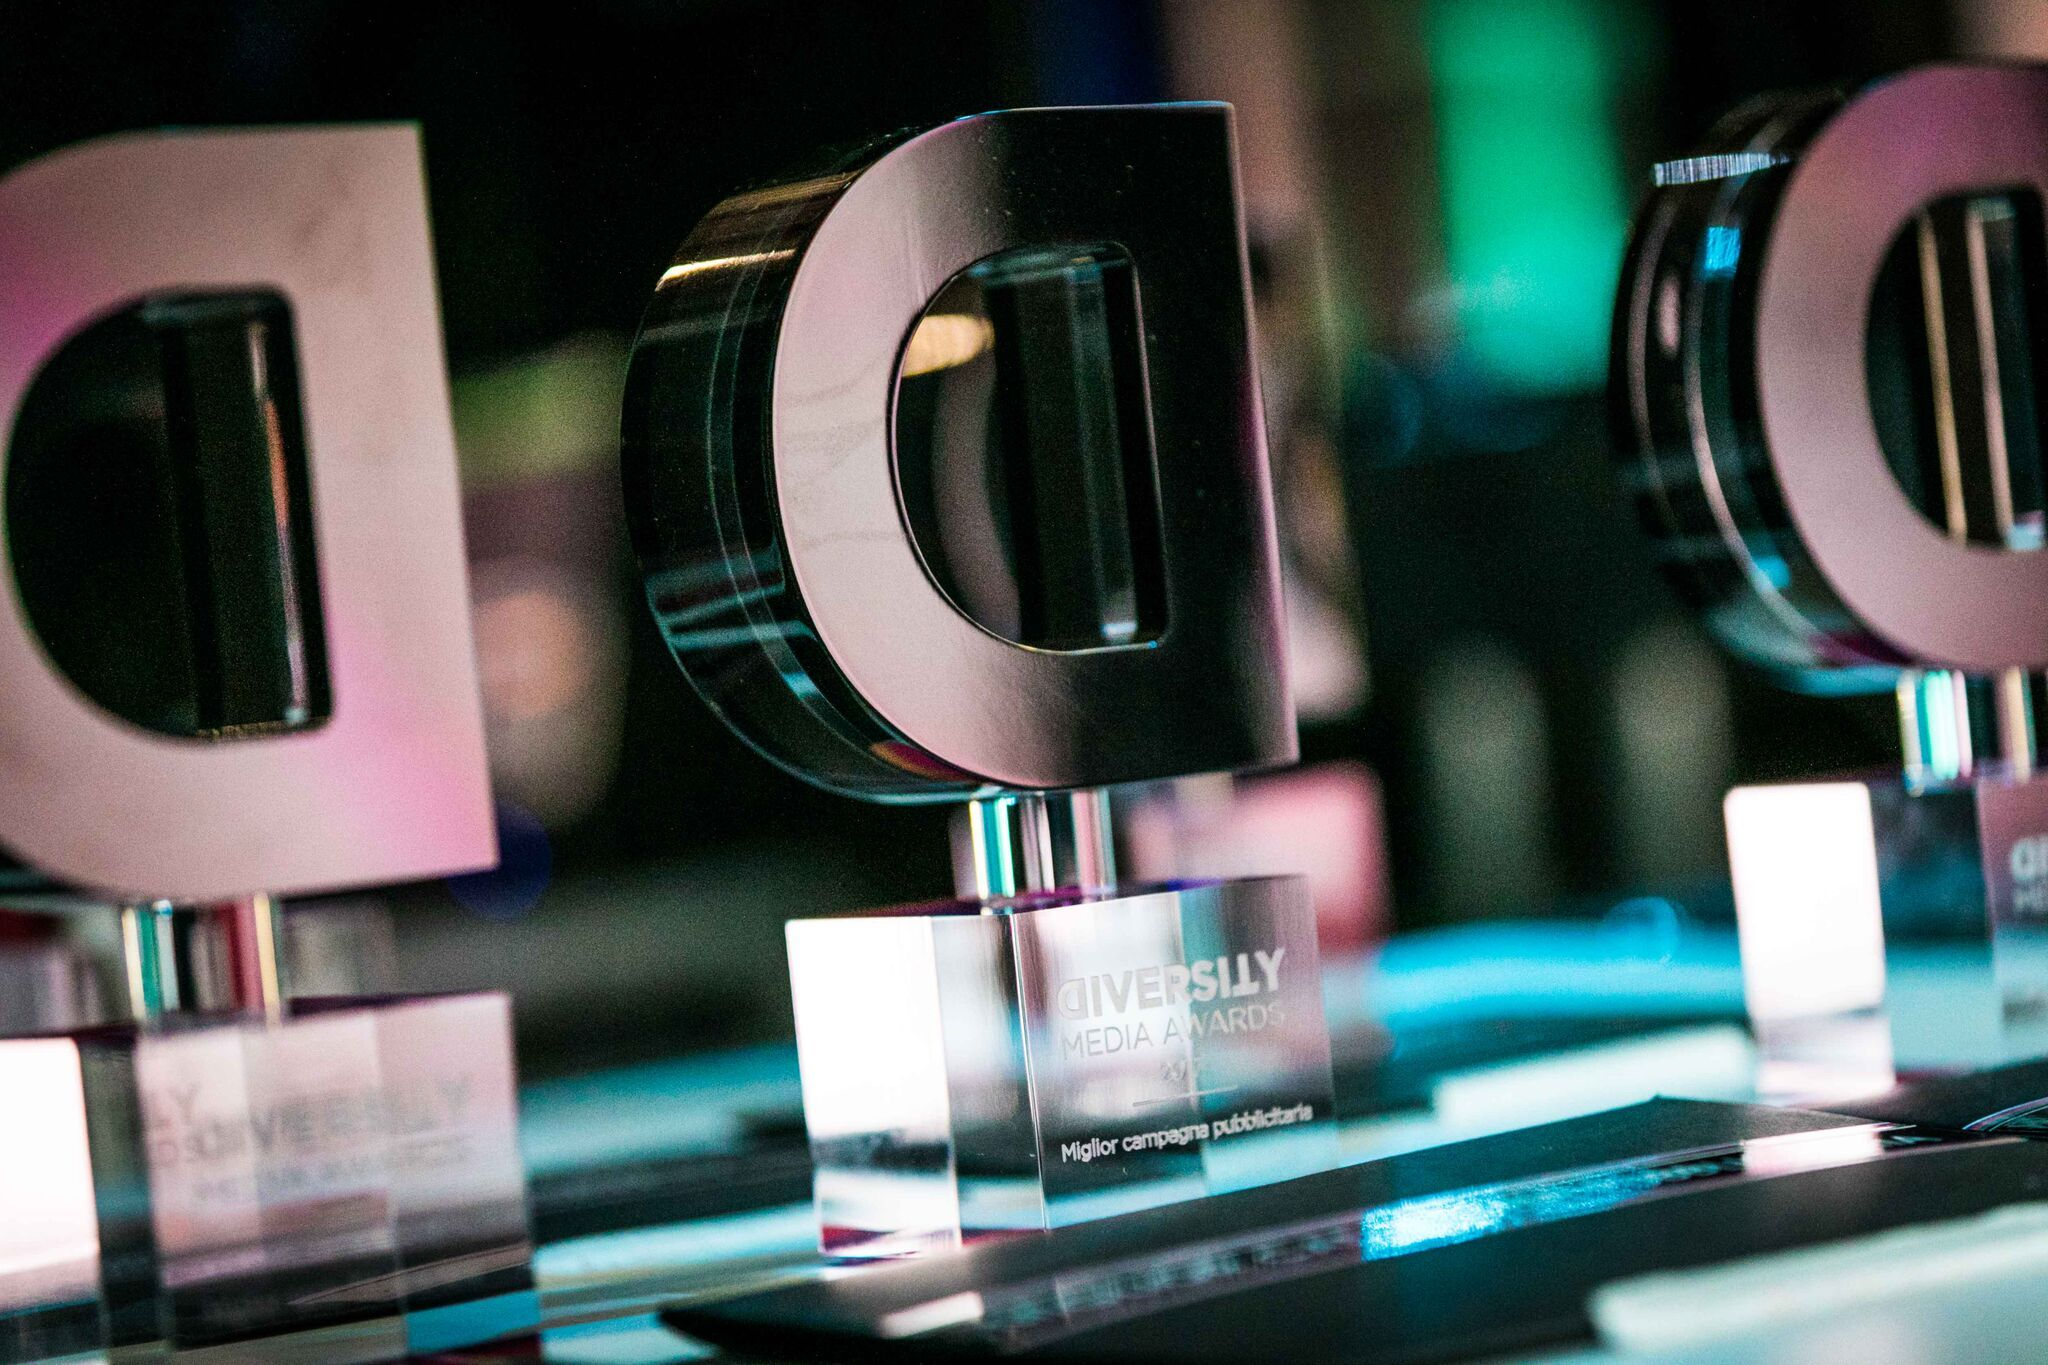 Diversity Media Awards: i candidati ai 'premi Oscar lgbt' italiani